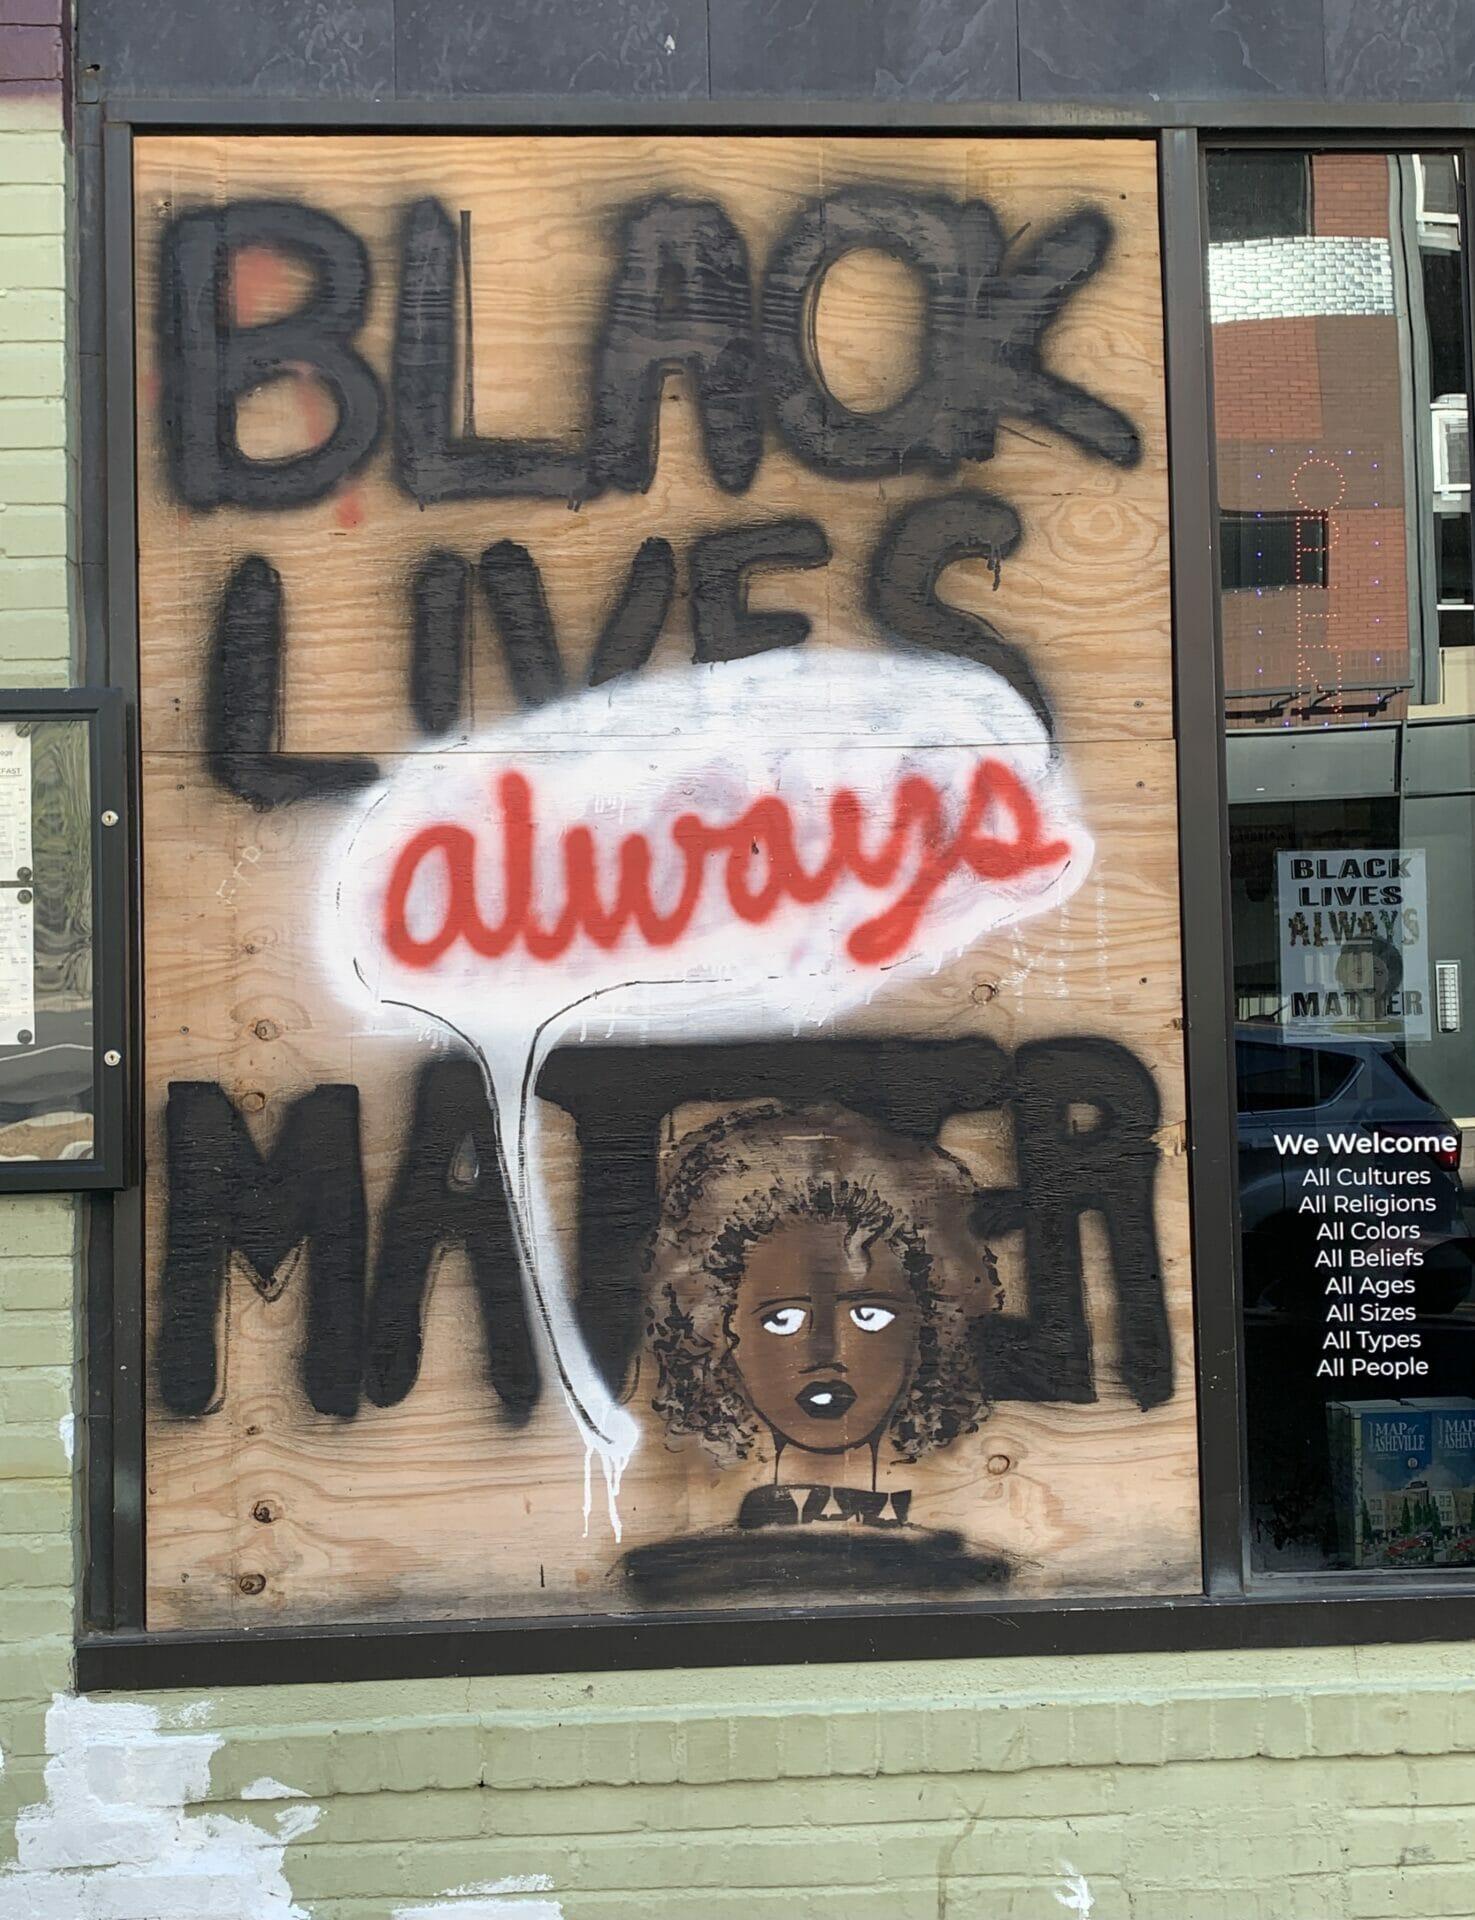 Black Lives Matter mural in Downtown Asheville